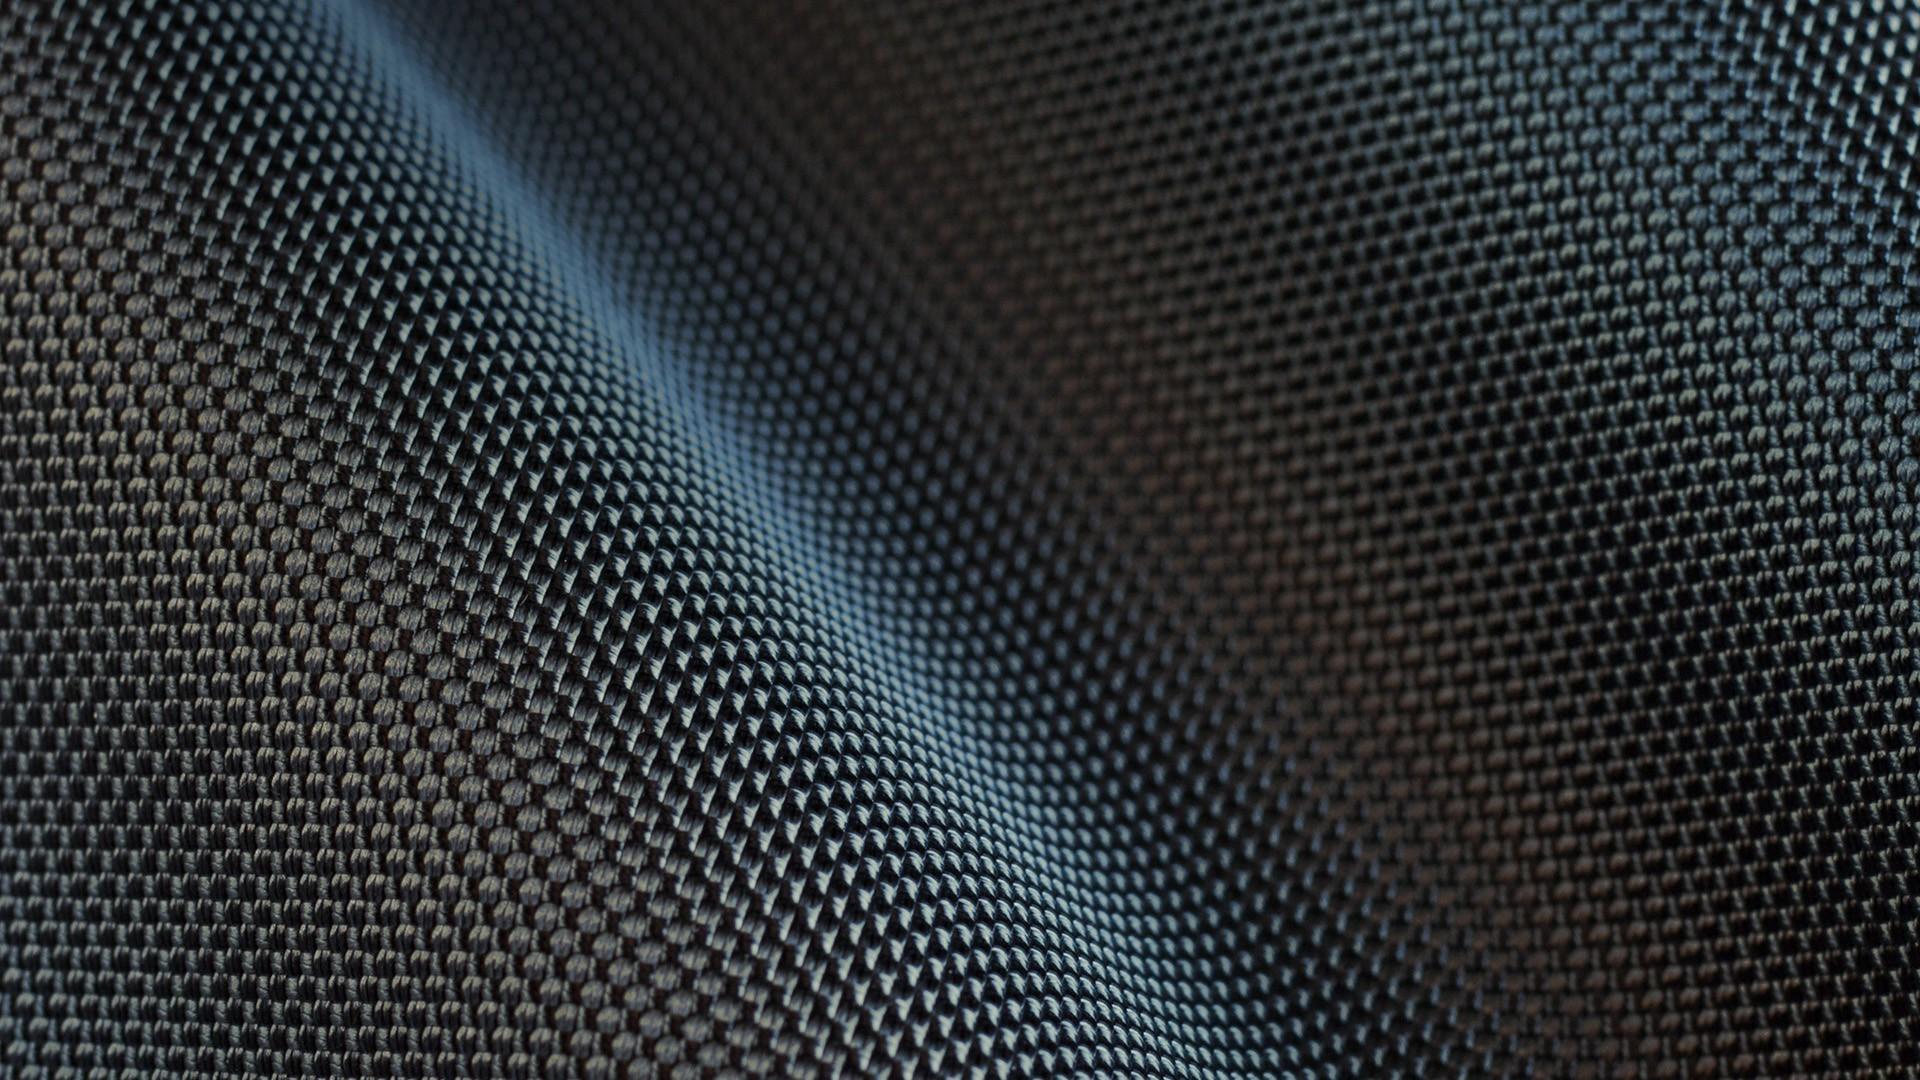 digital Art, Minimalism, Pattern, Texture, 3D, Carbon Fiber, Wavy Lines